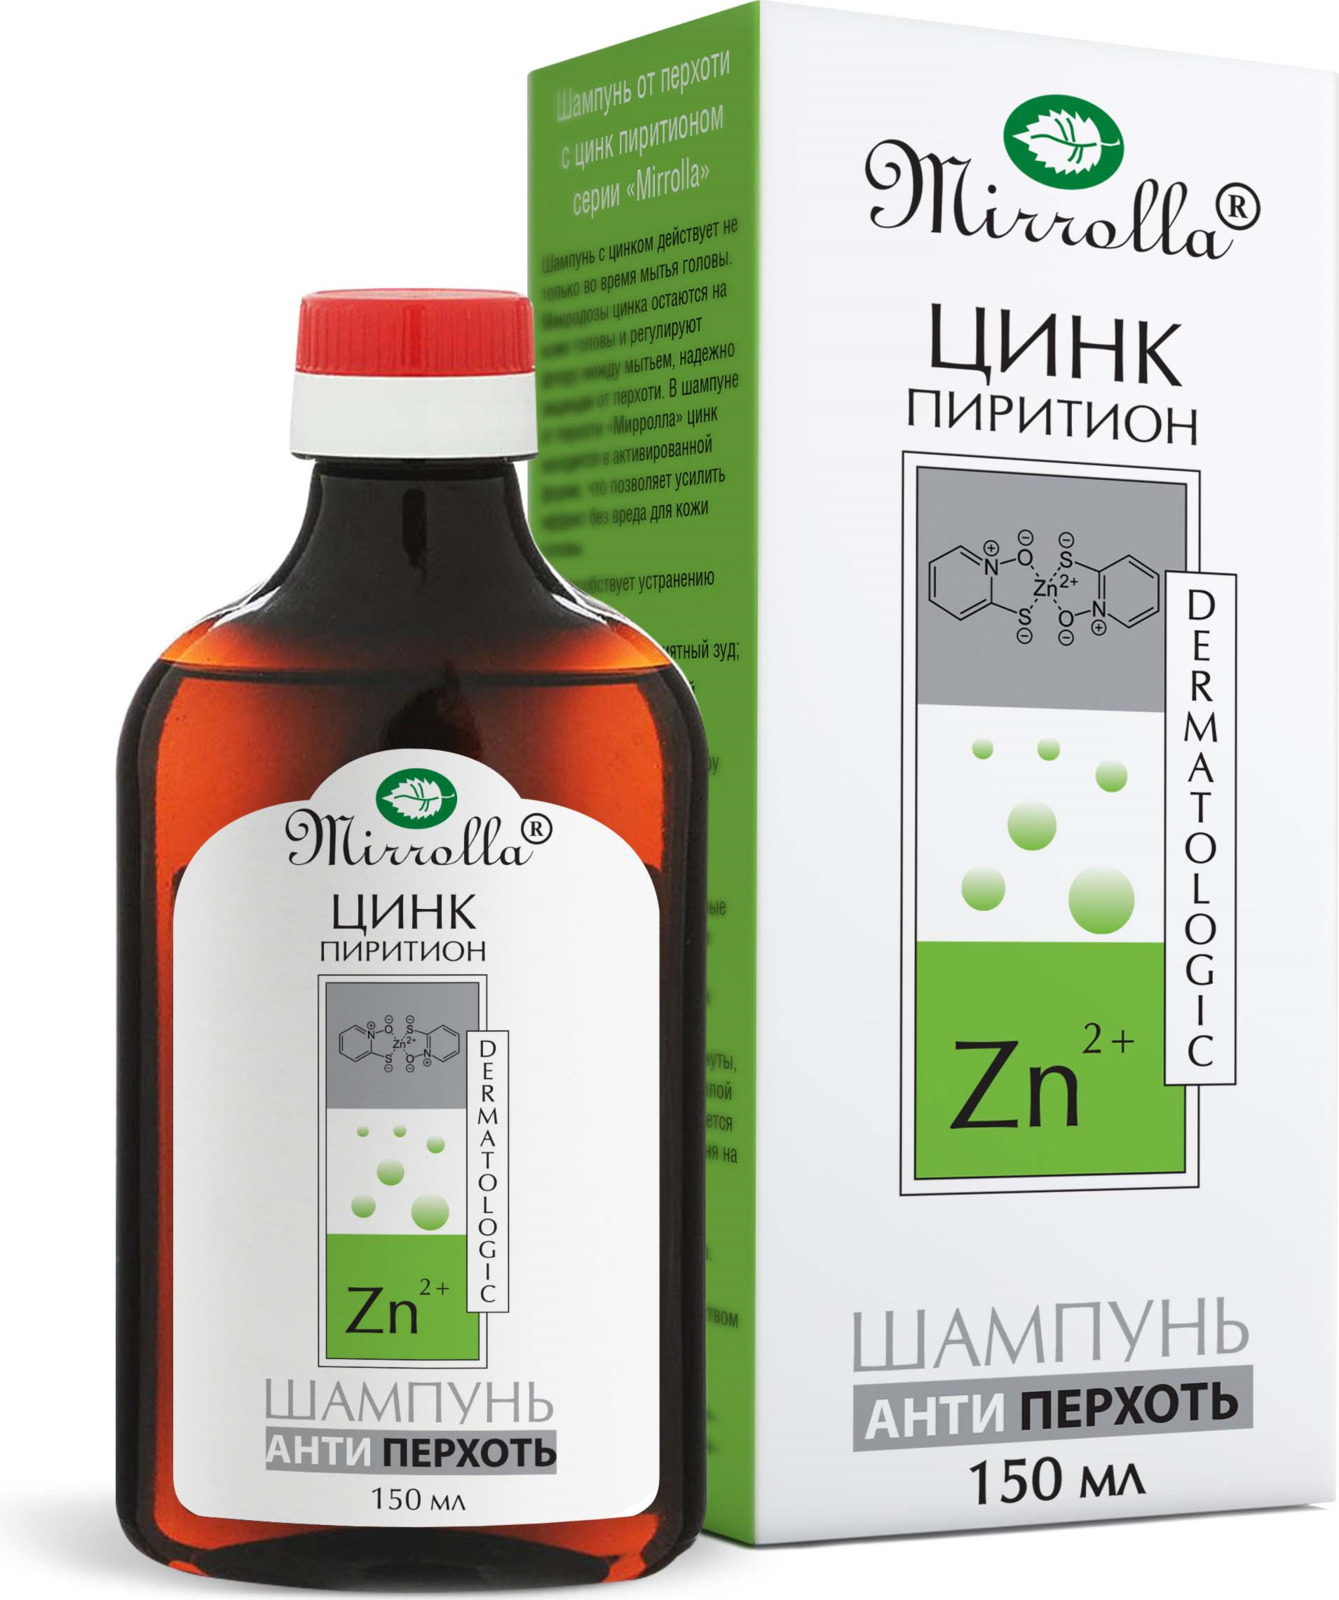 "Мирролла Шампунь от перхоти ""Mirrolla""® с цинк пиритионом 1%, 150 мл"